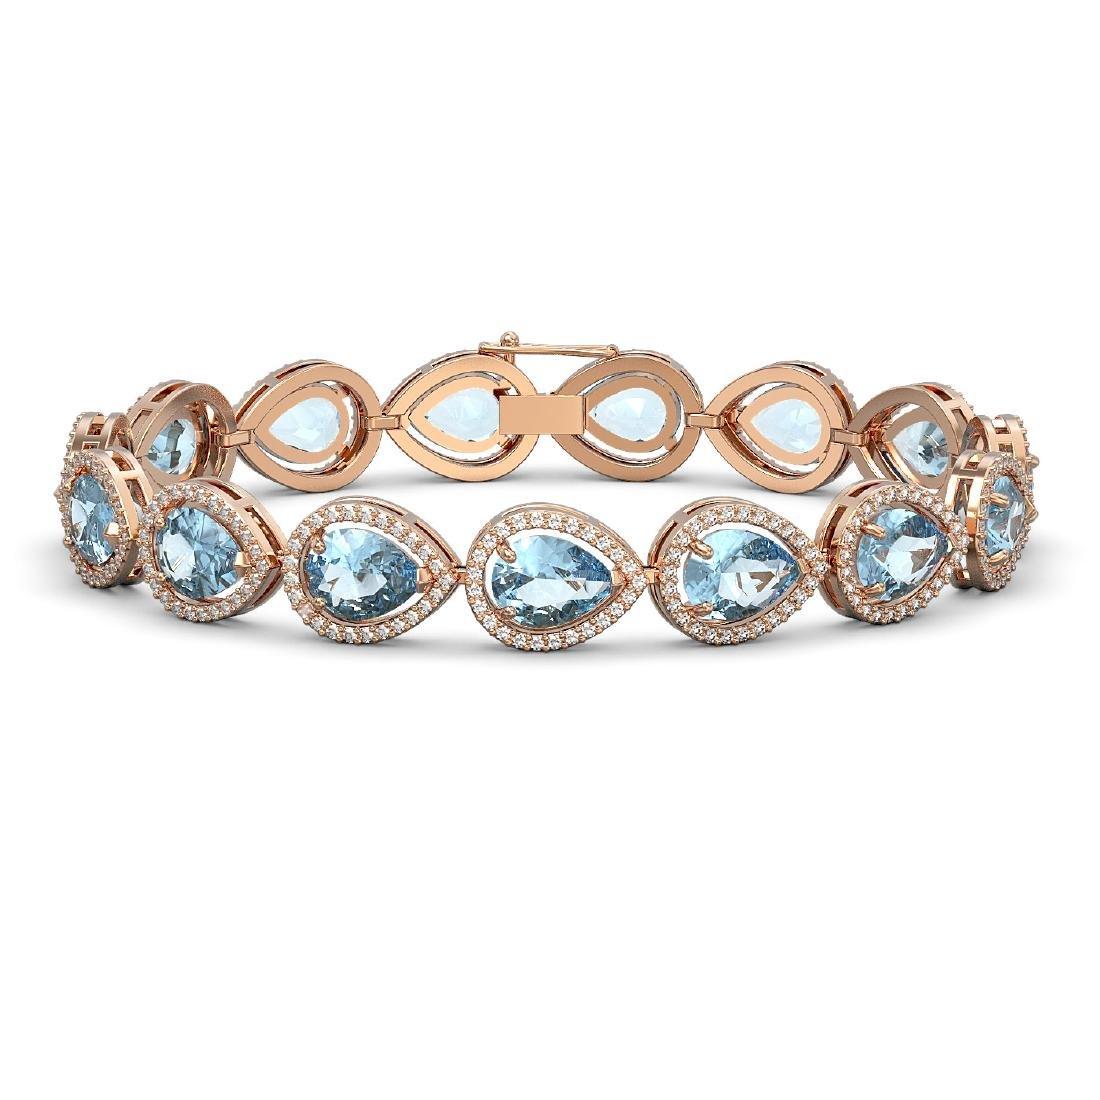 19.55 CTW Sky Topaz & Diamond Halo Bracelet 10K Rose